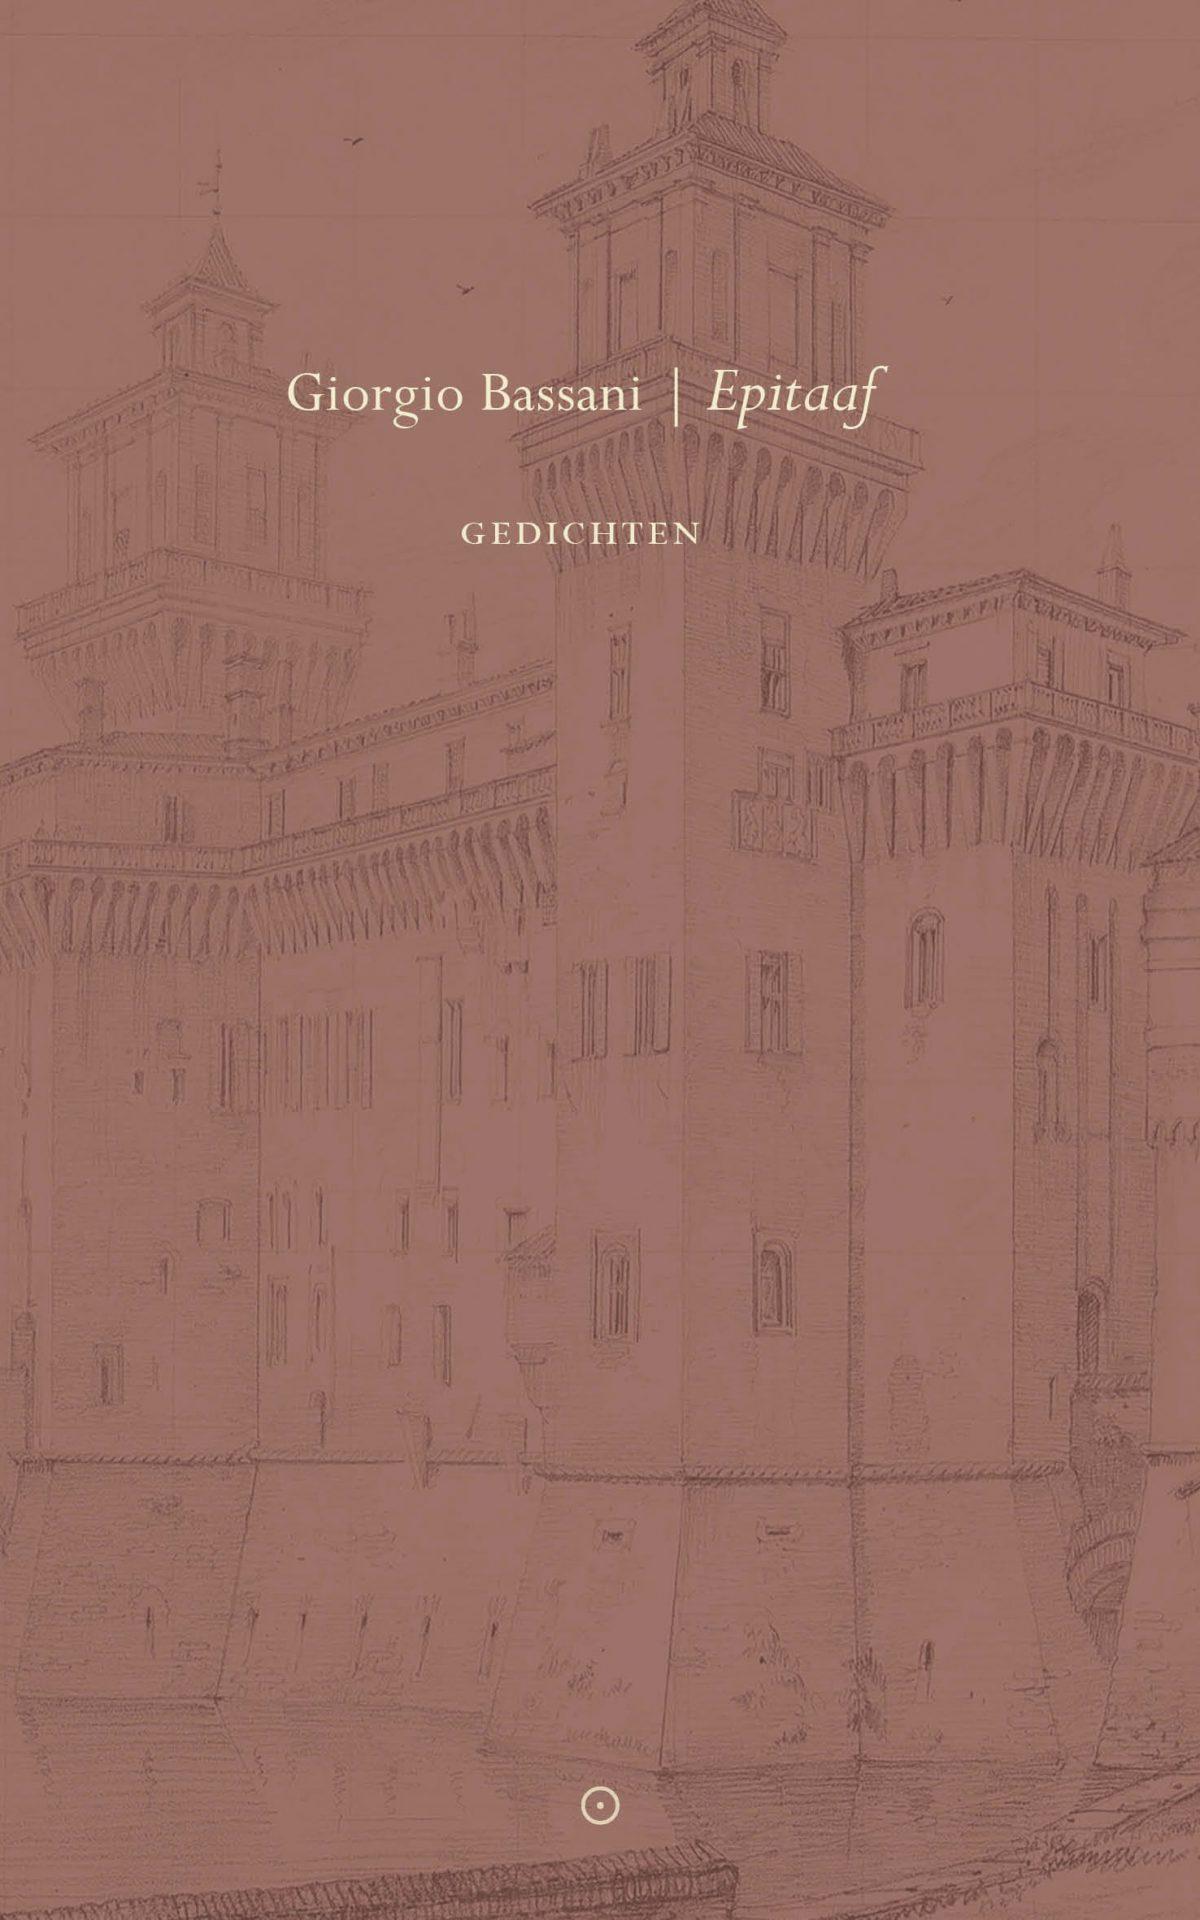 Epitaaf – Bassani